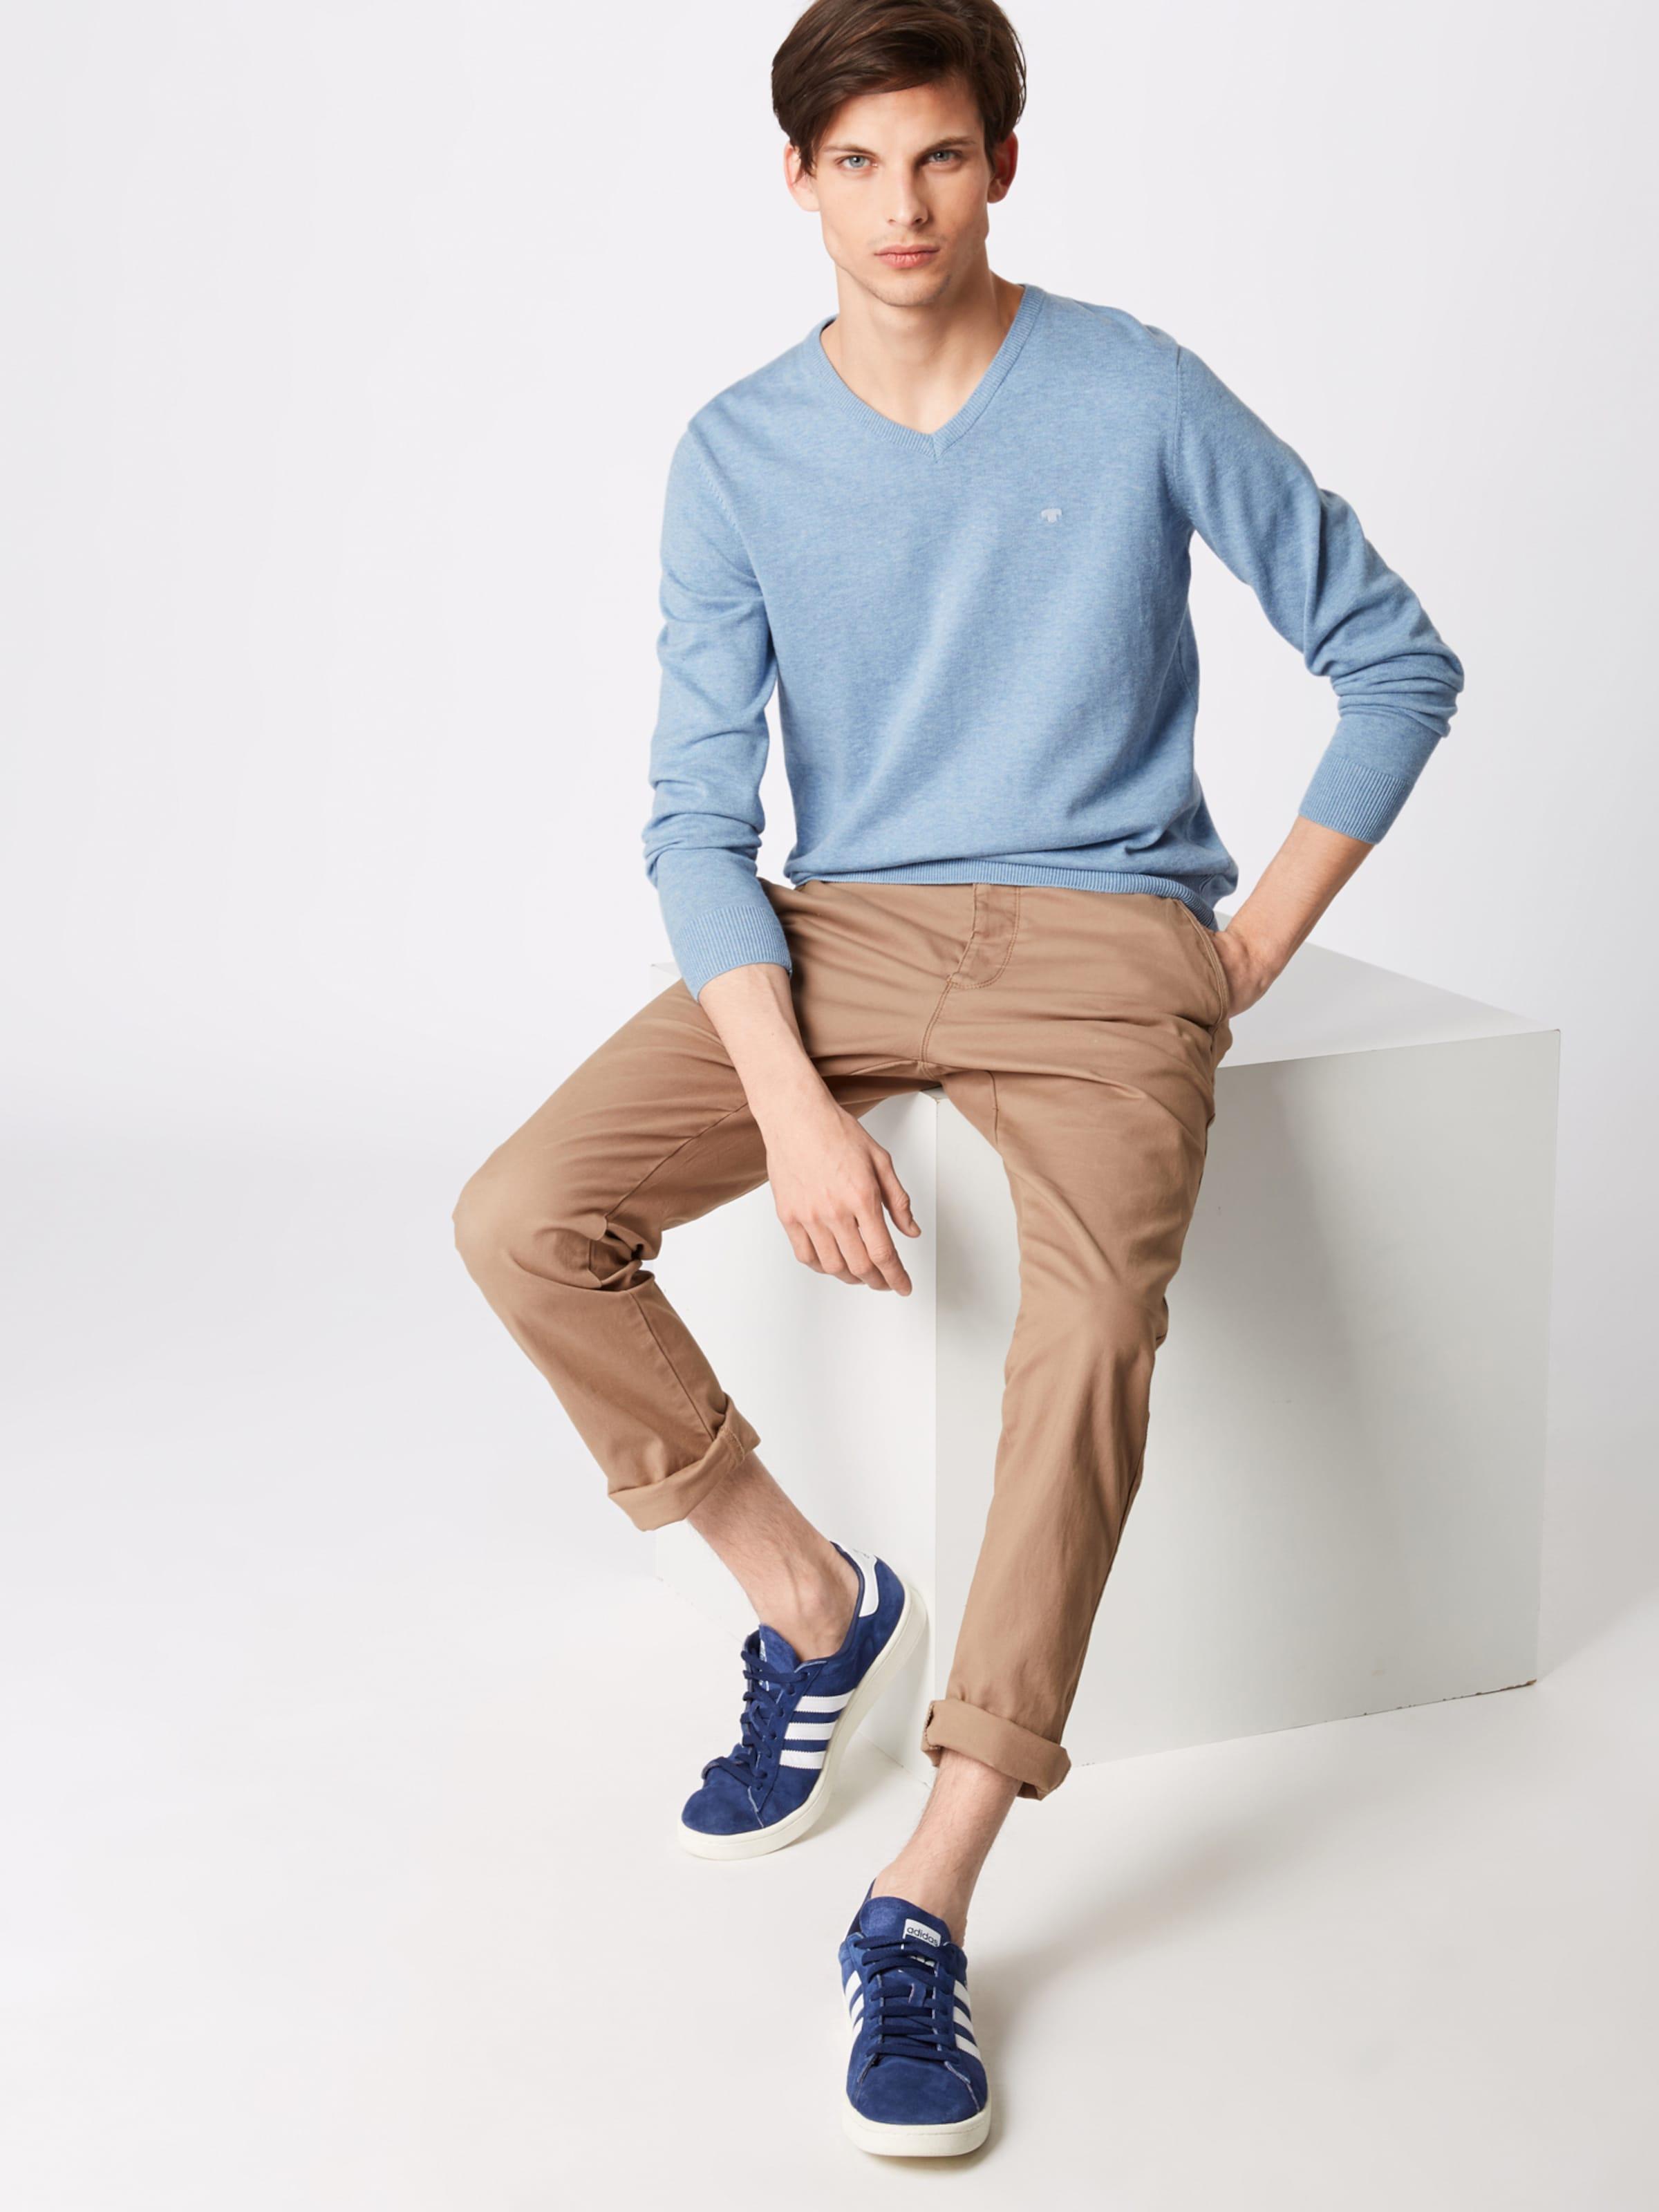 Tailor Sweatshirt Tom In Tailor Tom Blau stQrdh